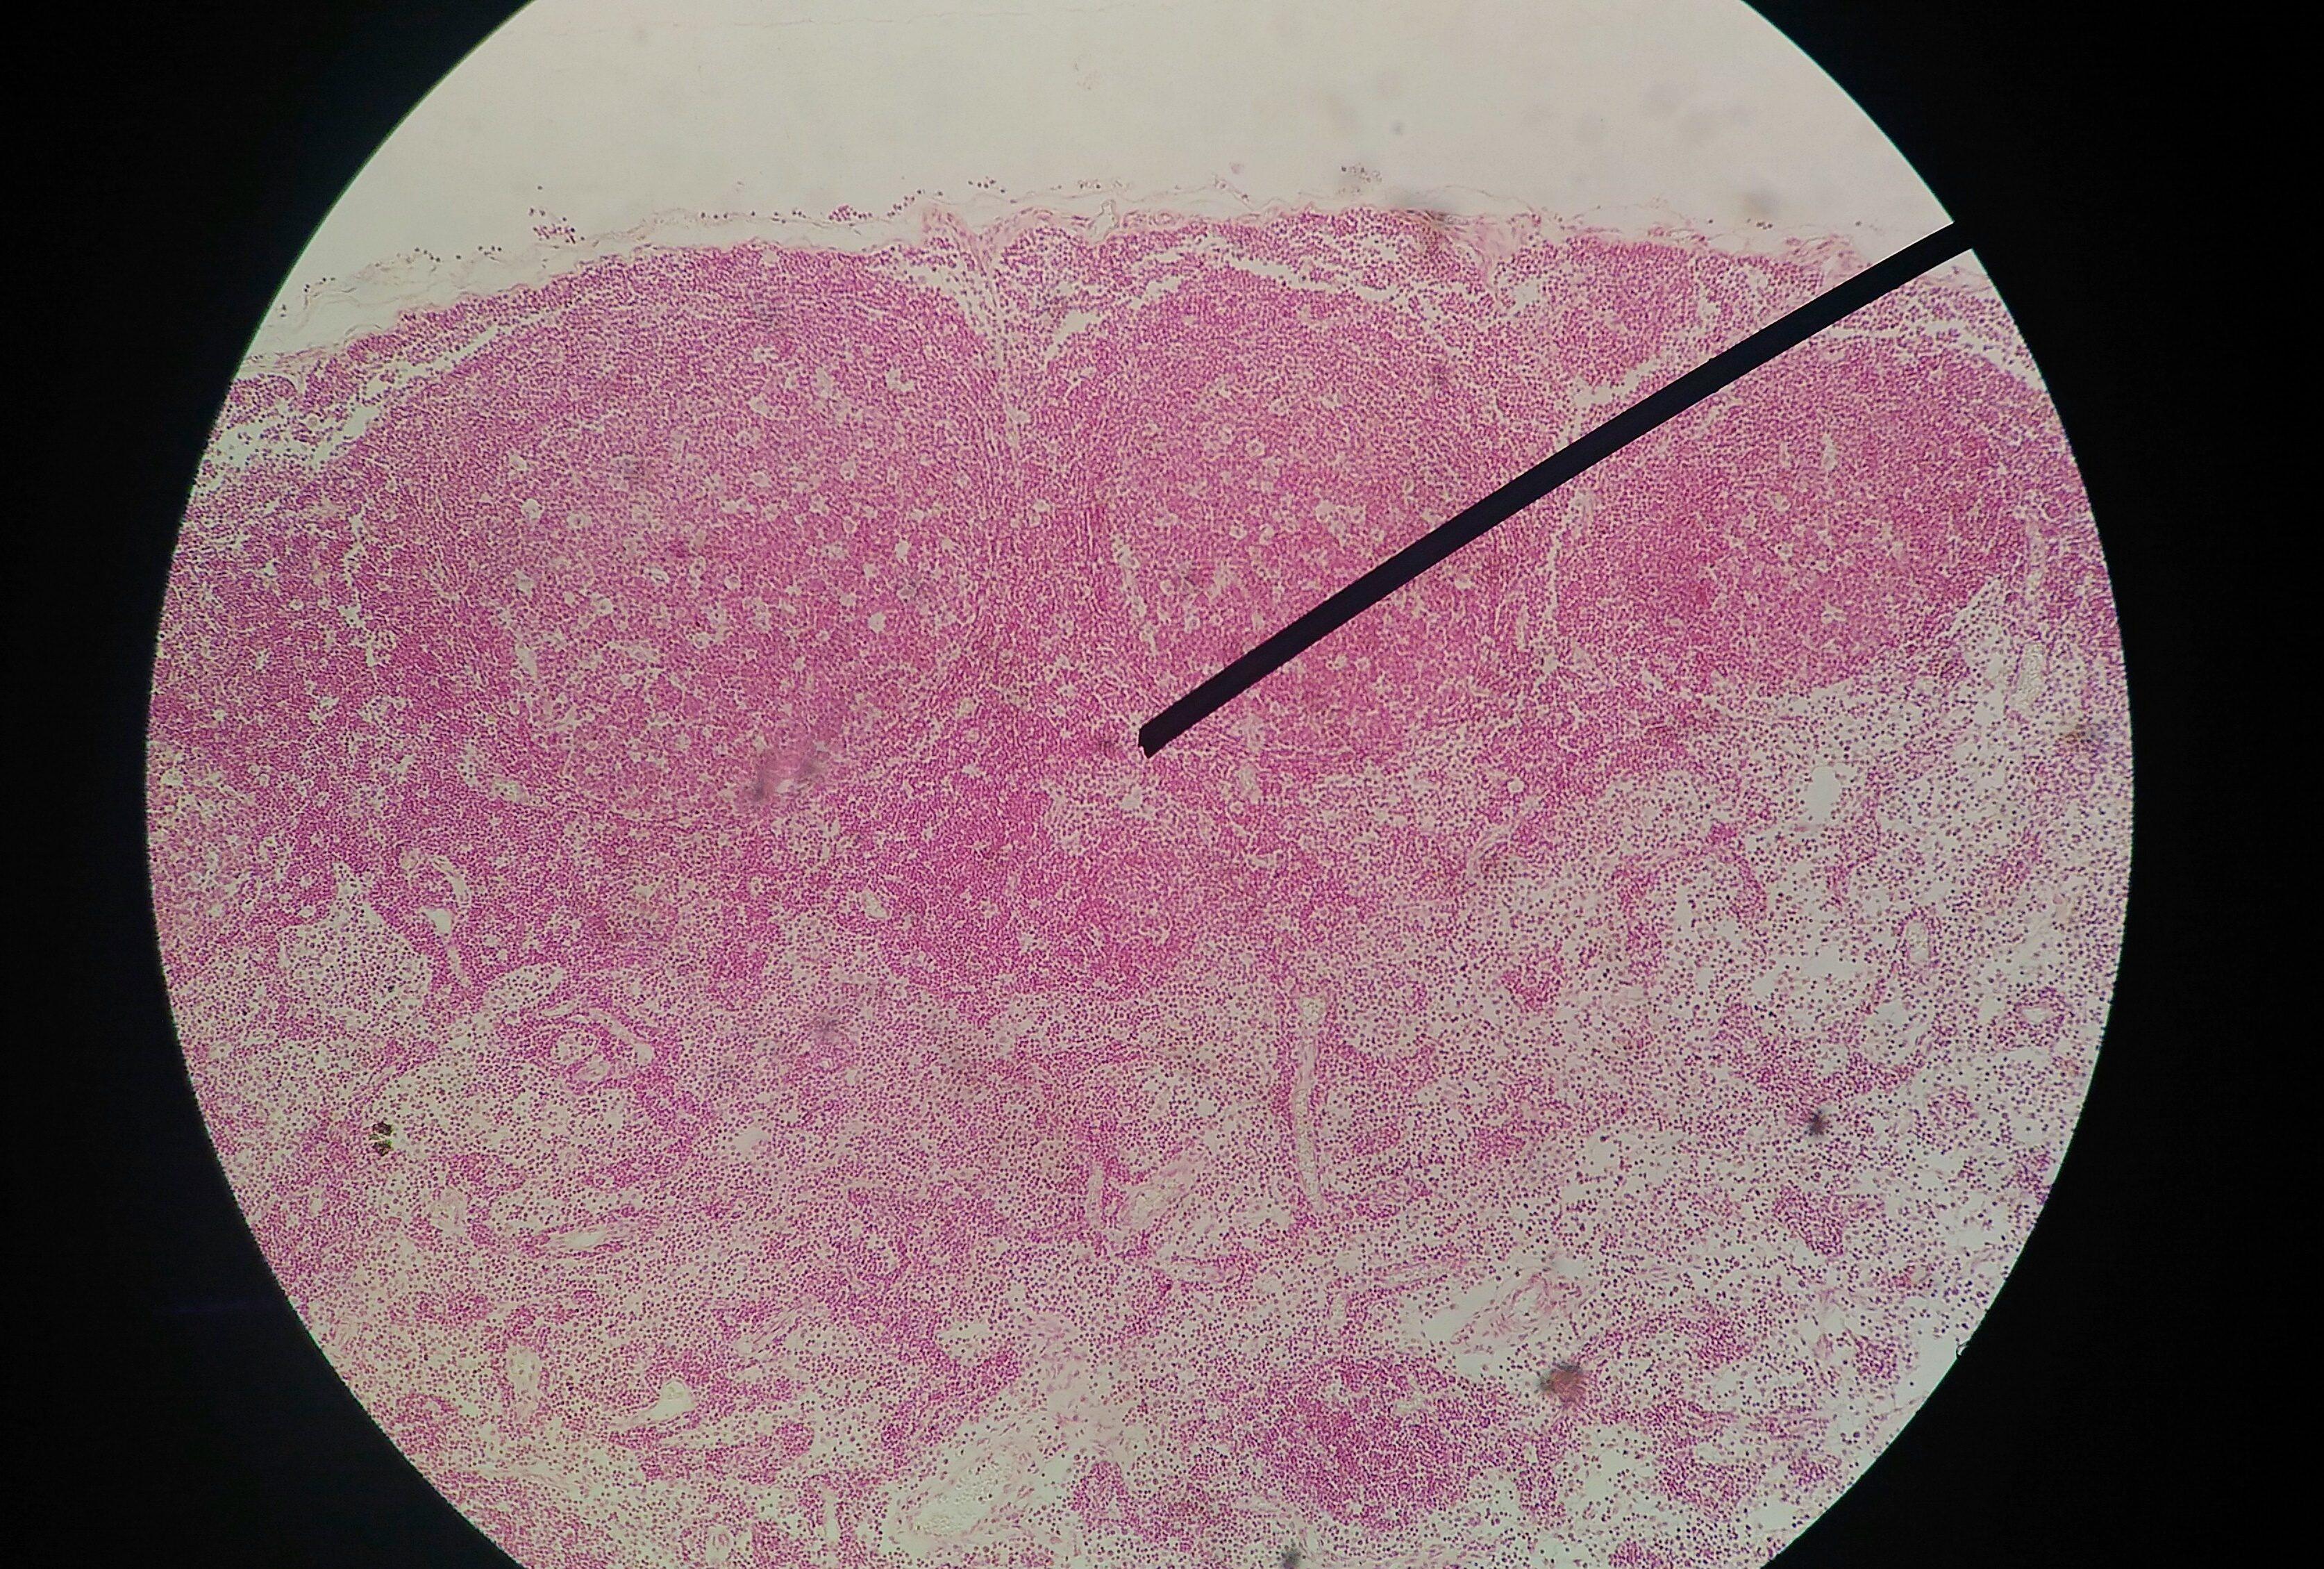 test papilloma negativo